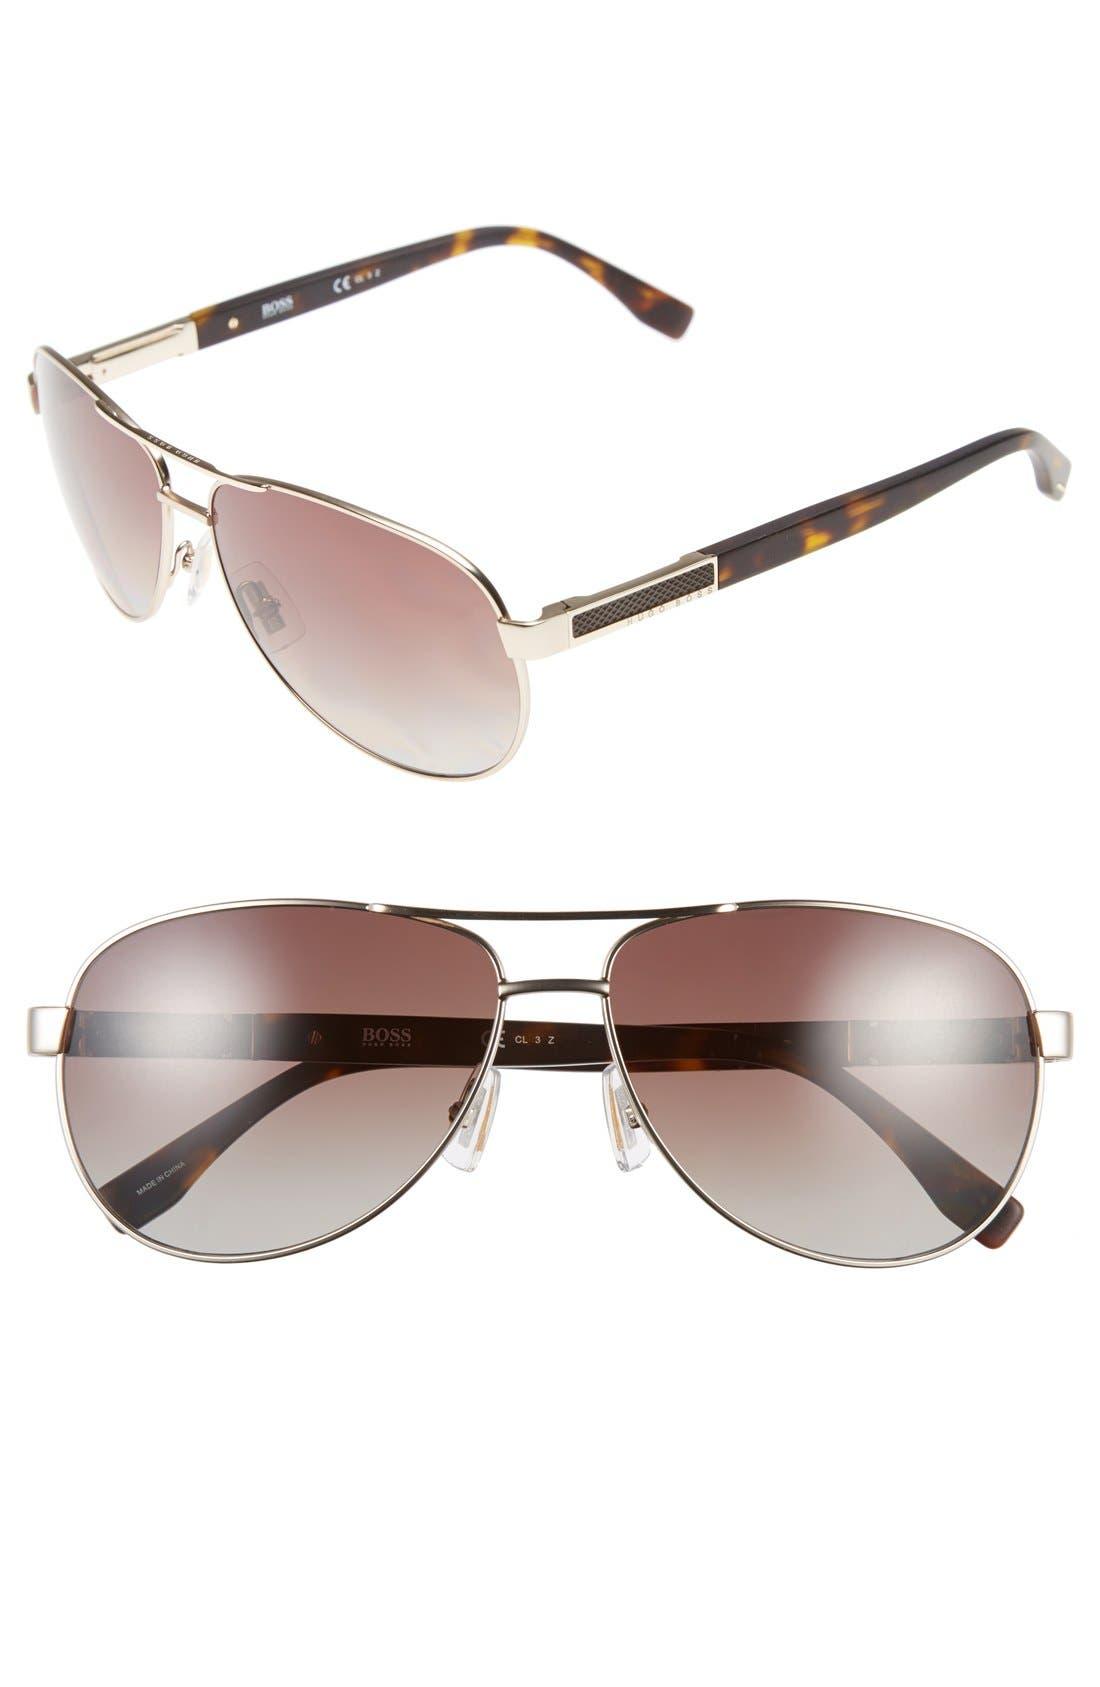 62mm Polarized Aviator Sunglasses,                         Main,                         color,